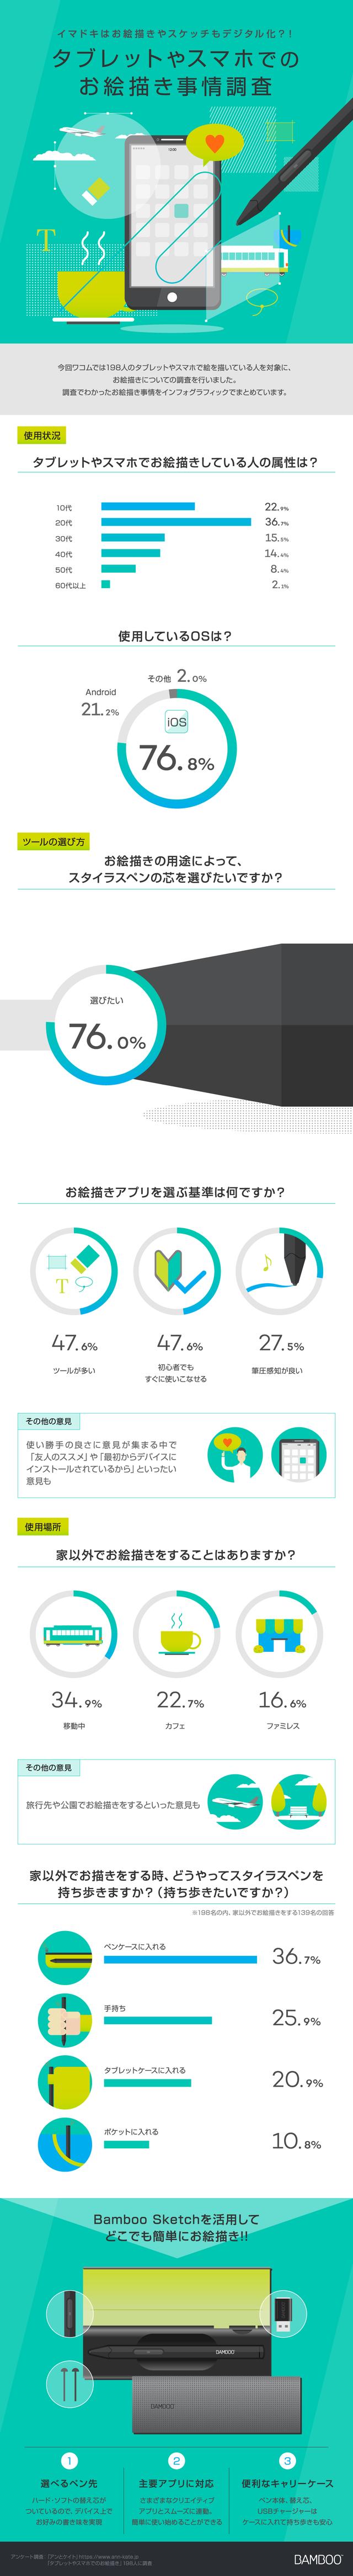 170720 %e3%81%8a%e7%b5%b5%e6%8f%8f%e3%81%8d cs5 ol